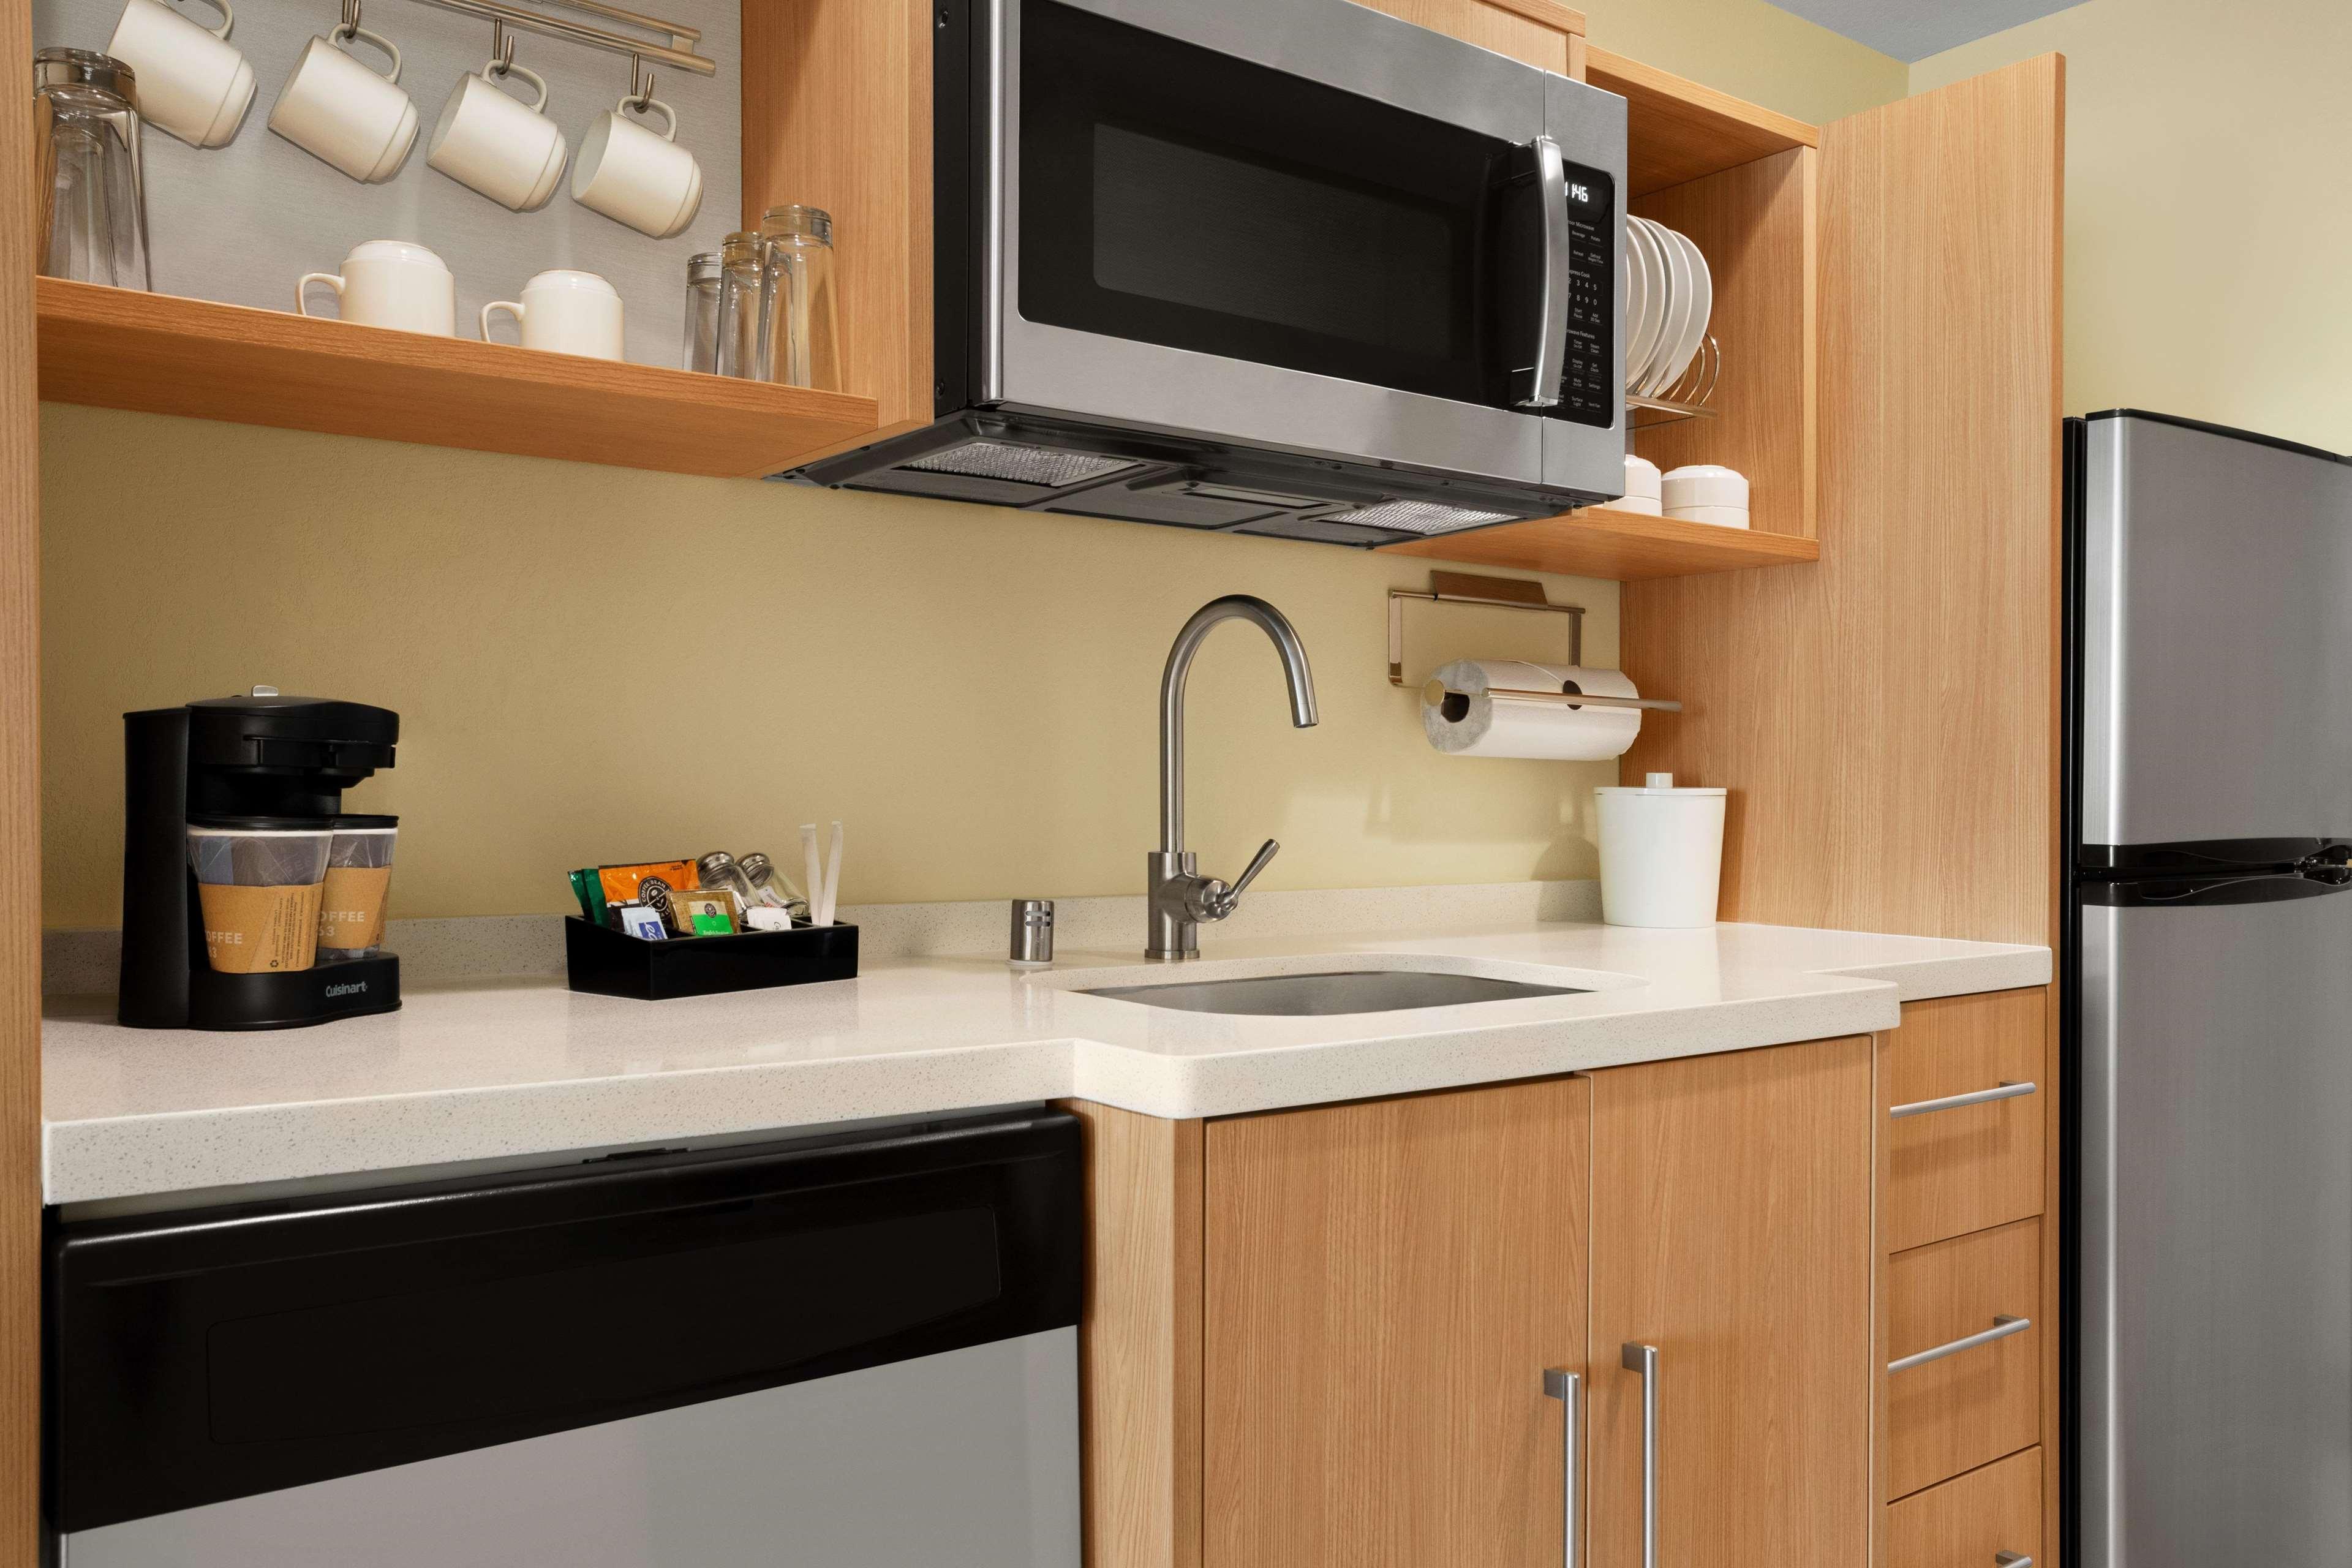 Home2 Suites by Hilton Elko image 18